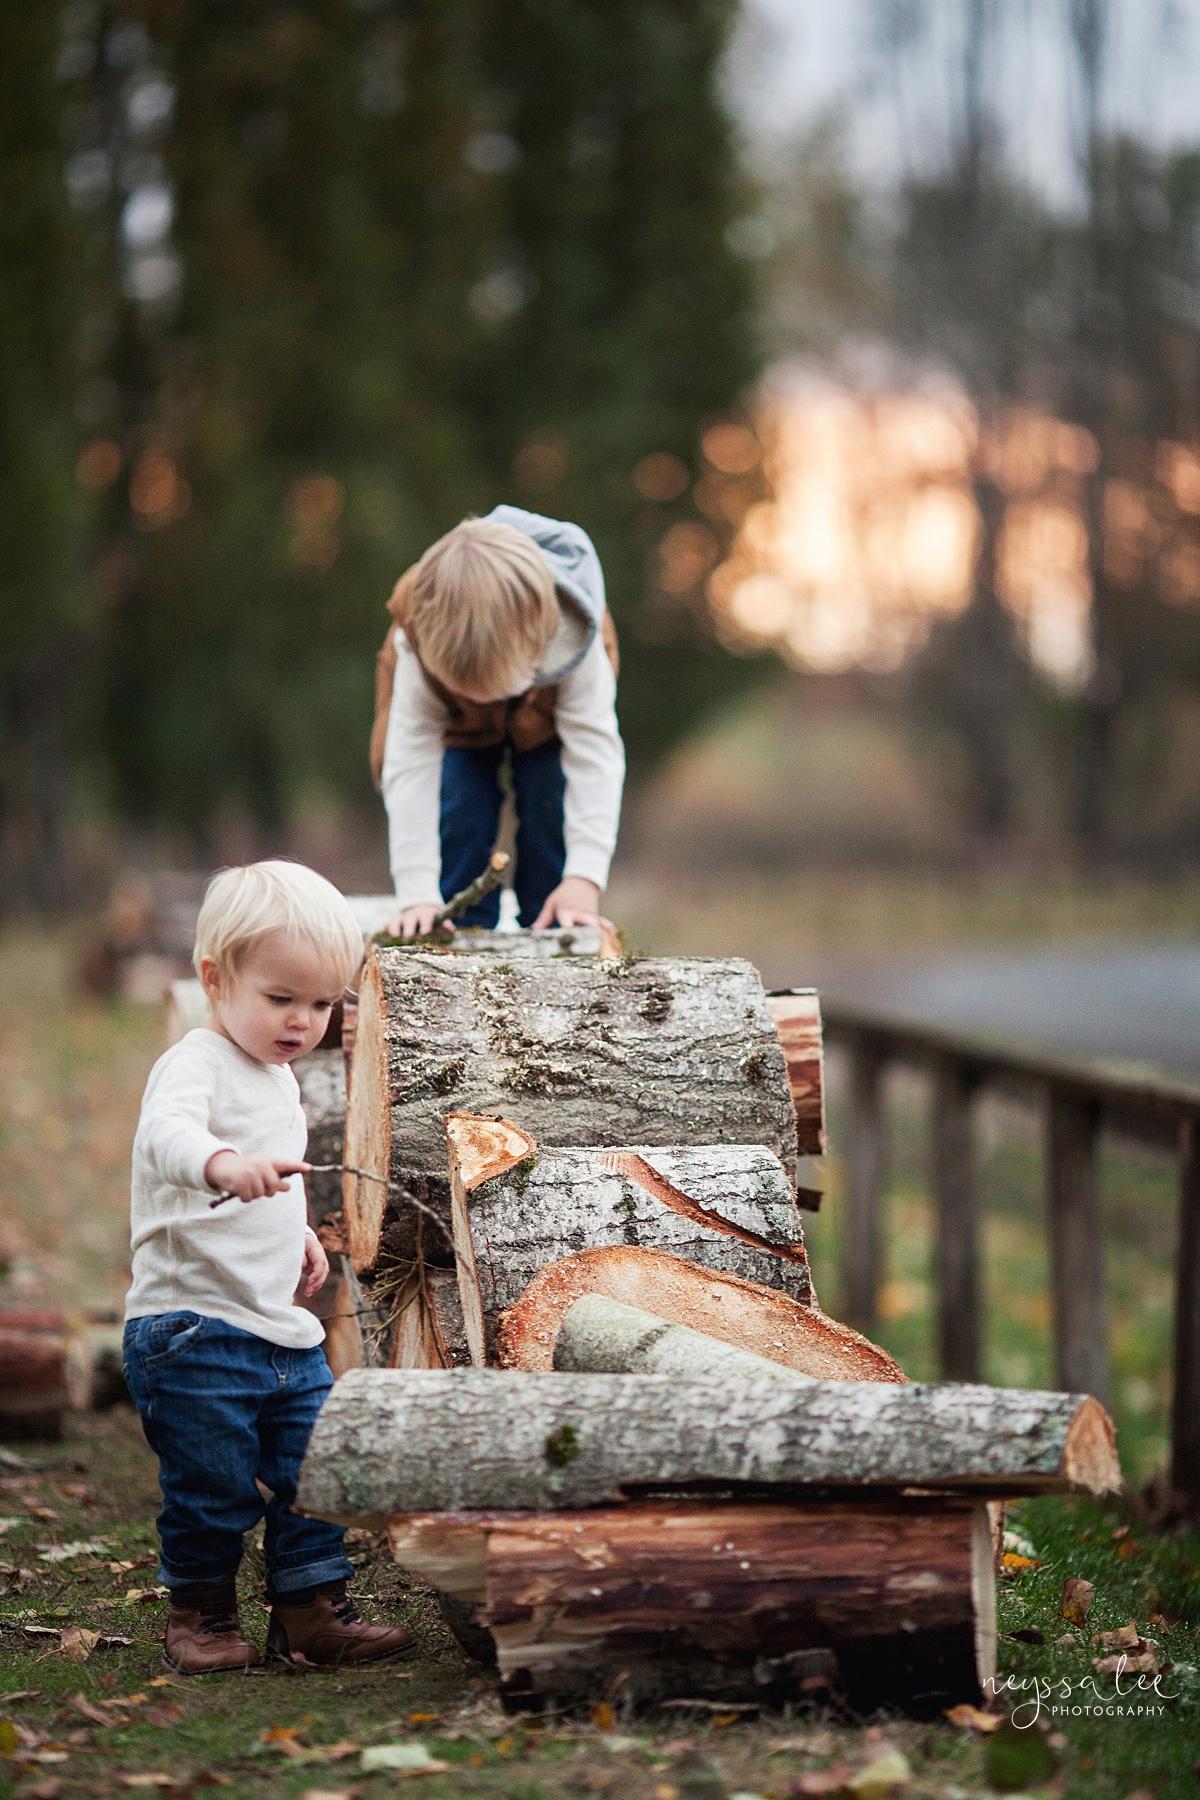 Neyssa Lee Photography, Snoqualmie Family Photographer, Fall Family Photos, boys playing on woodpile